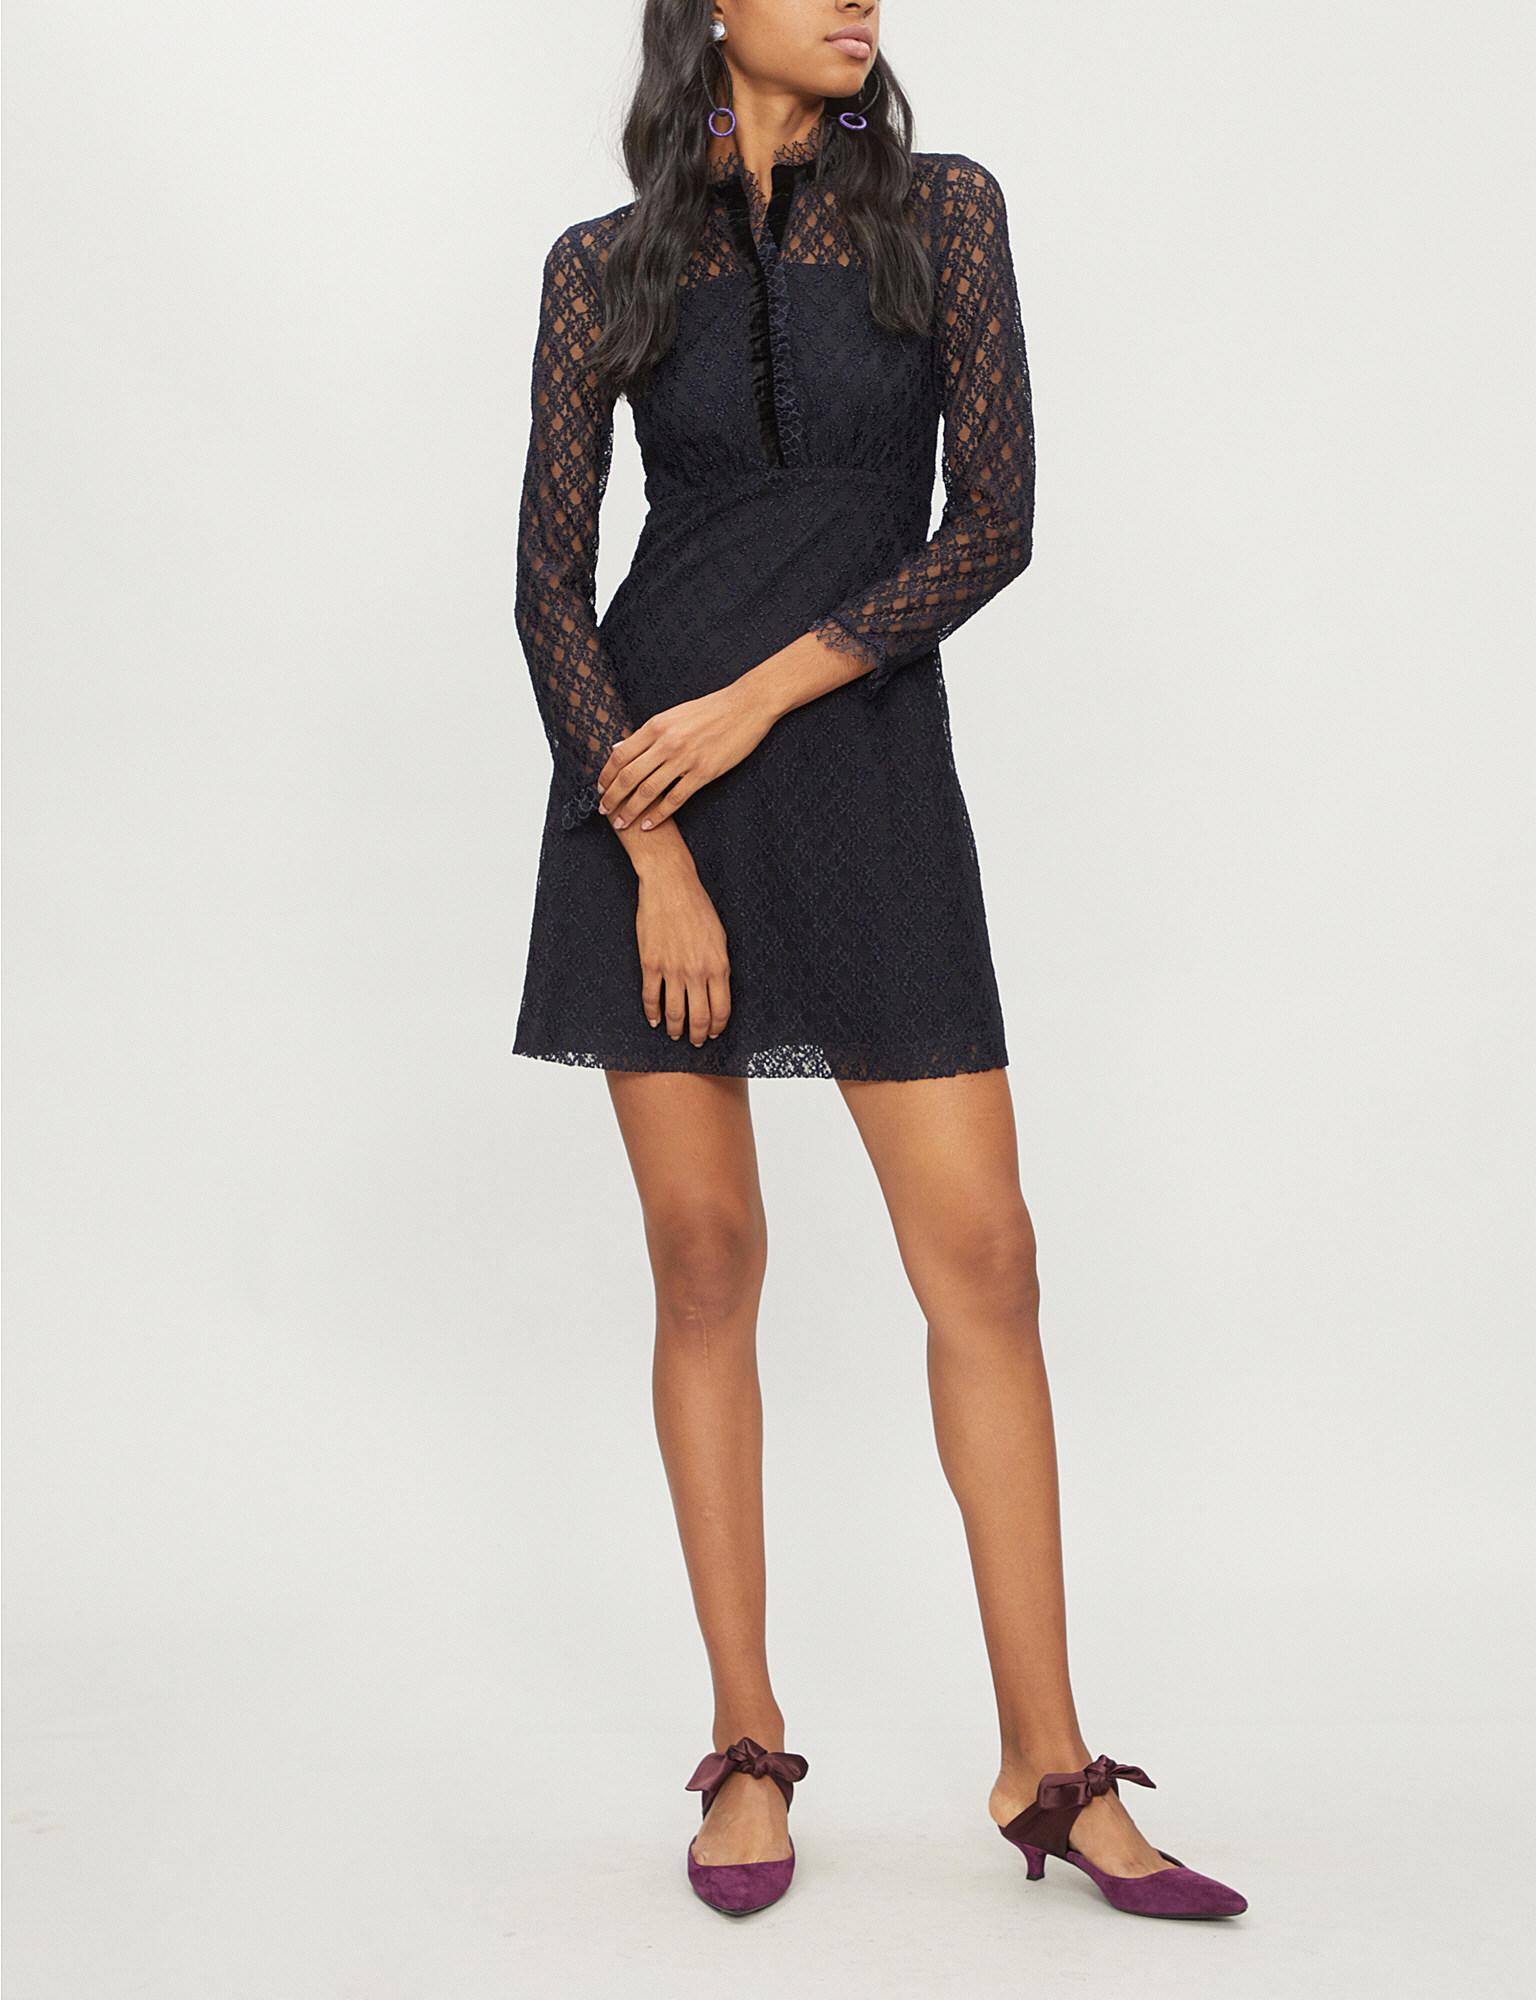 Velvet Trim Lace Dress